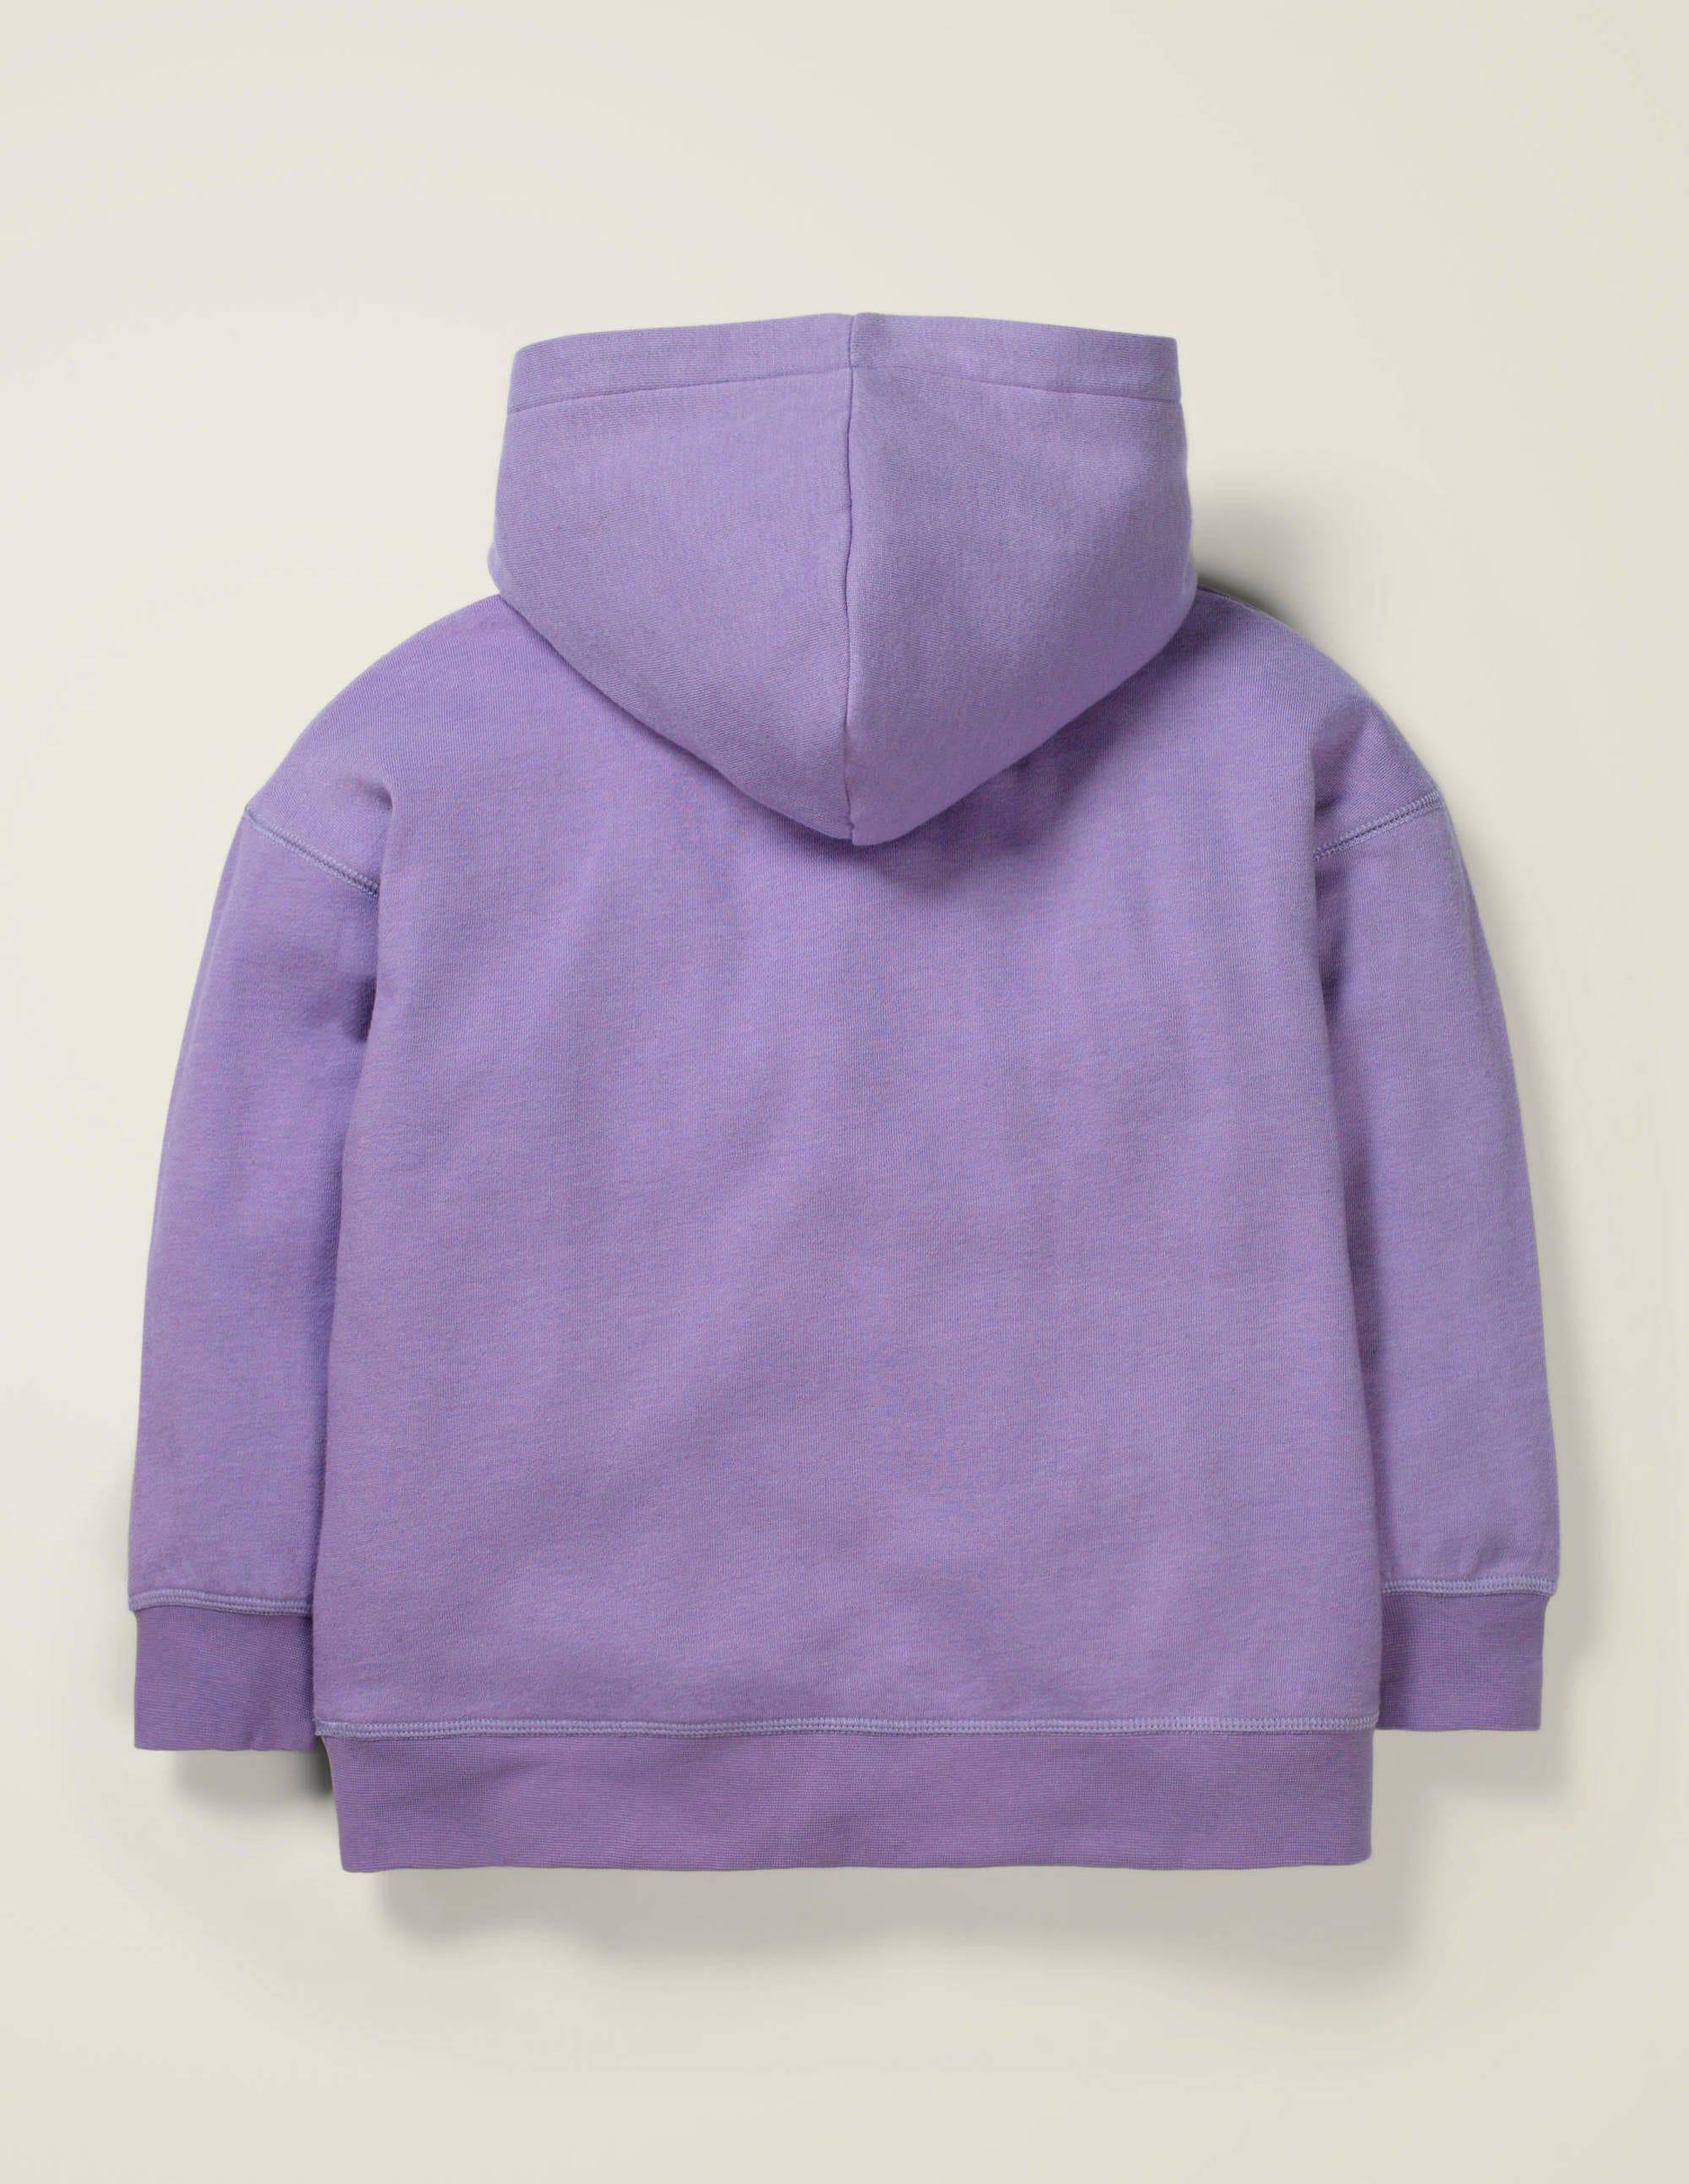 Small Hoodie Two items In Winter Dutch Flag Boys Casual Soft Comfortable Sweatshirts Kangaroo Pocket Hoodies